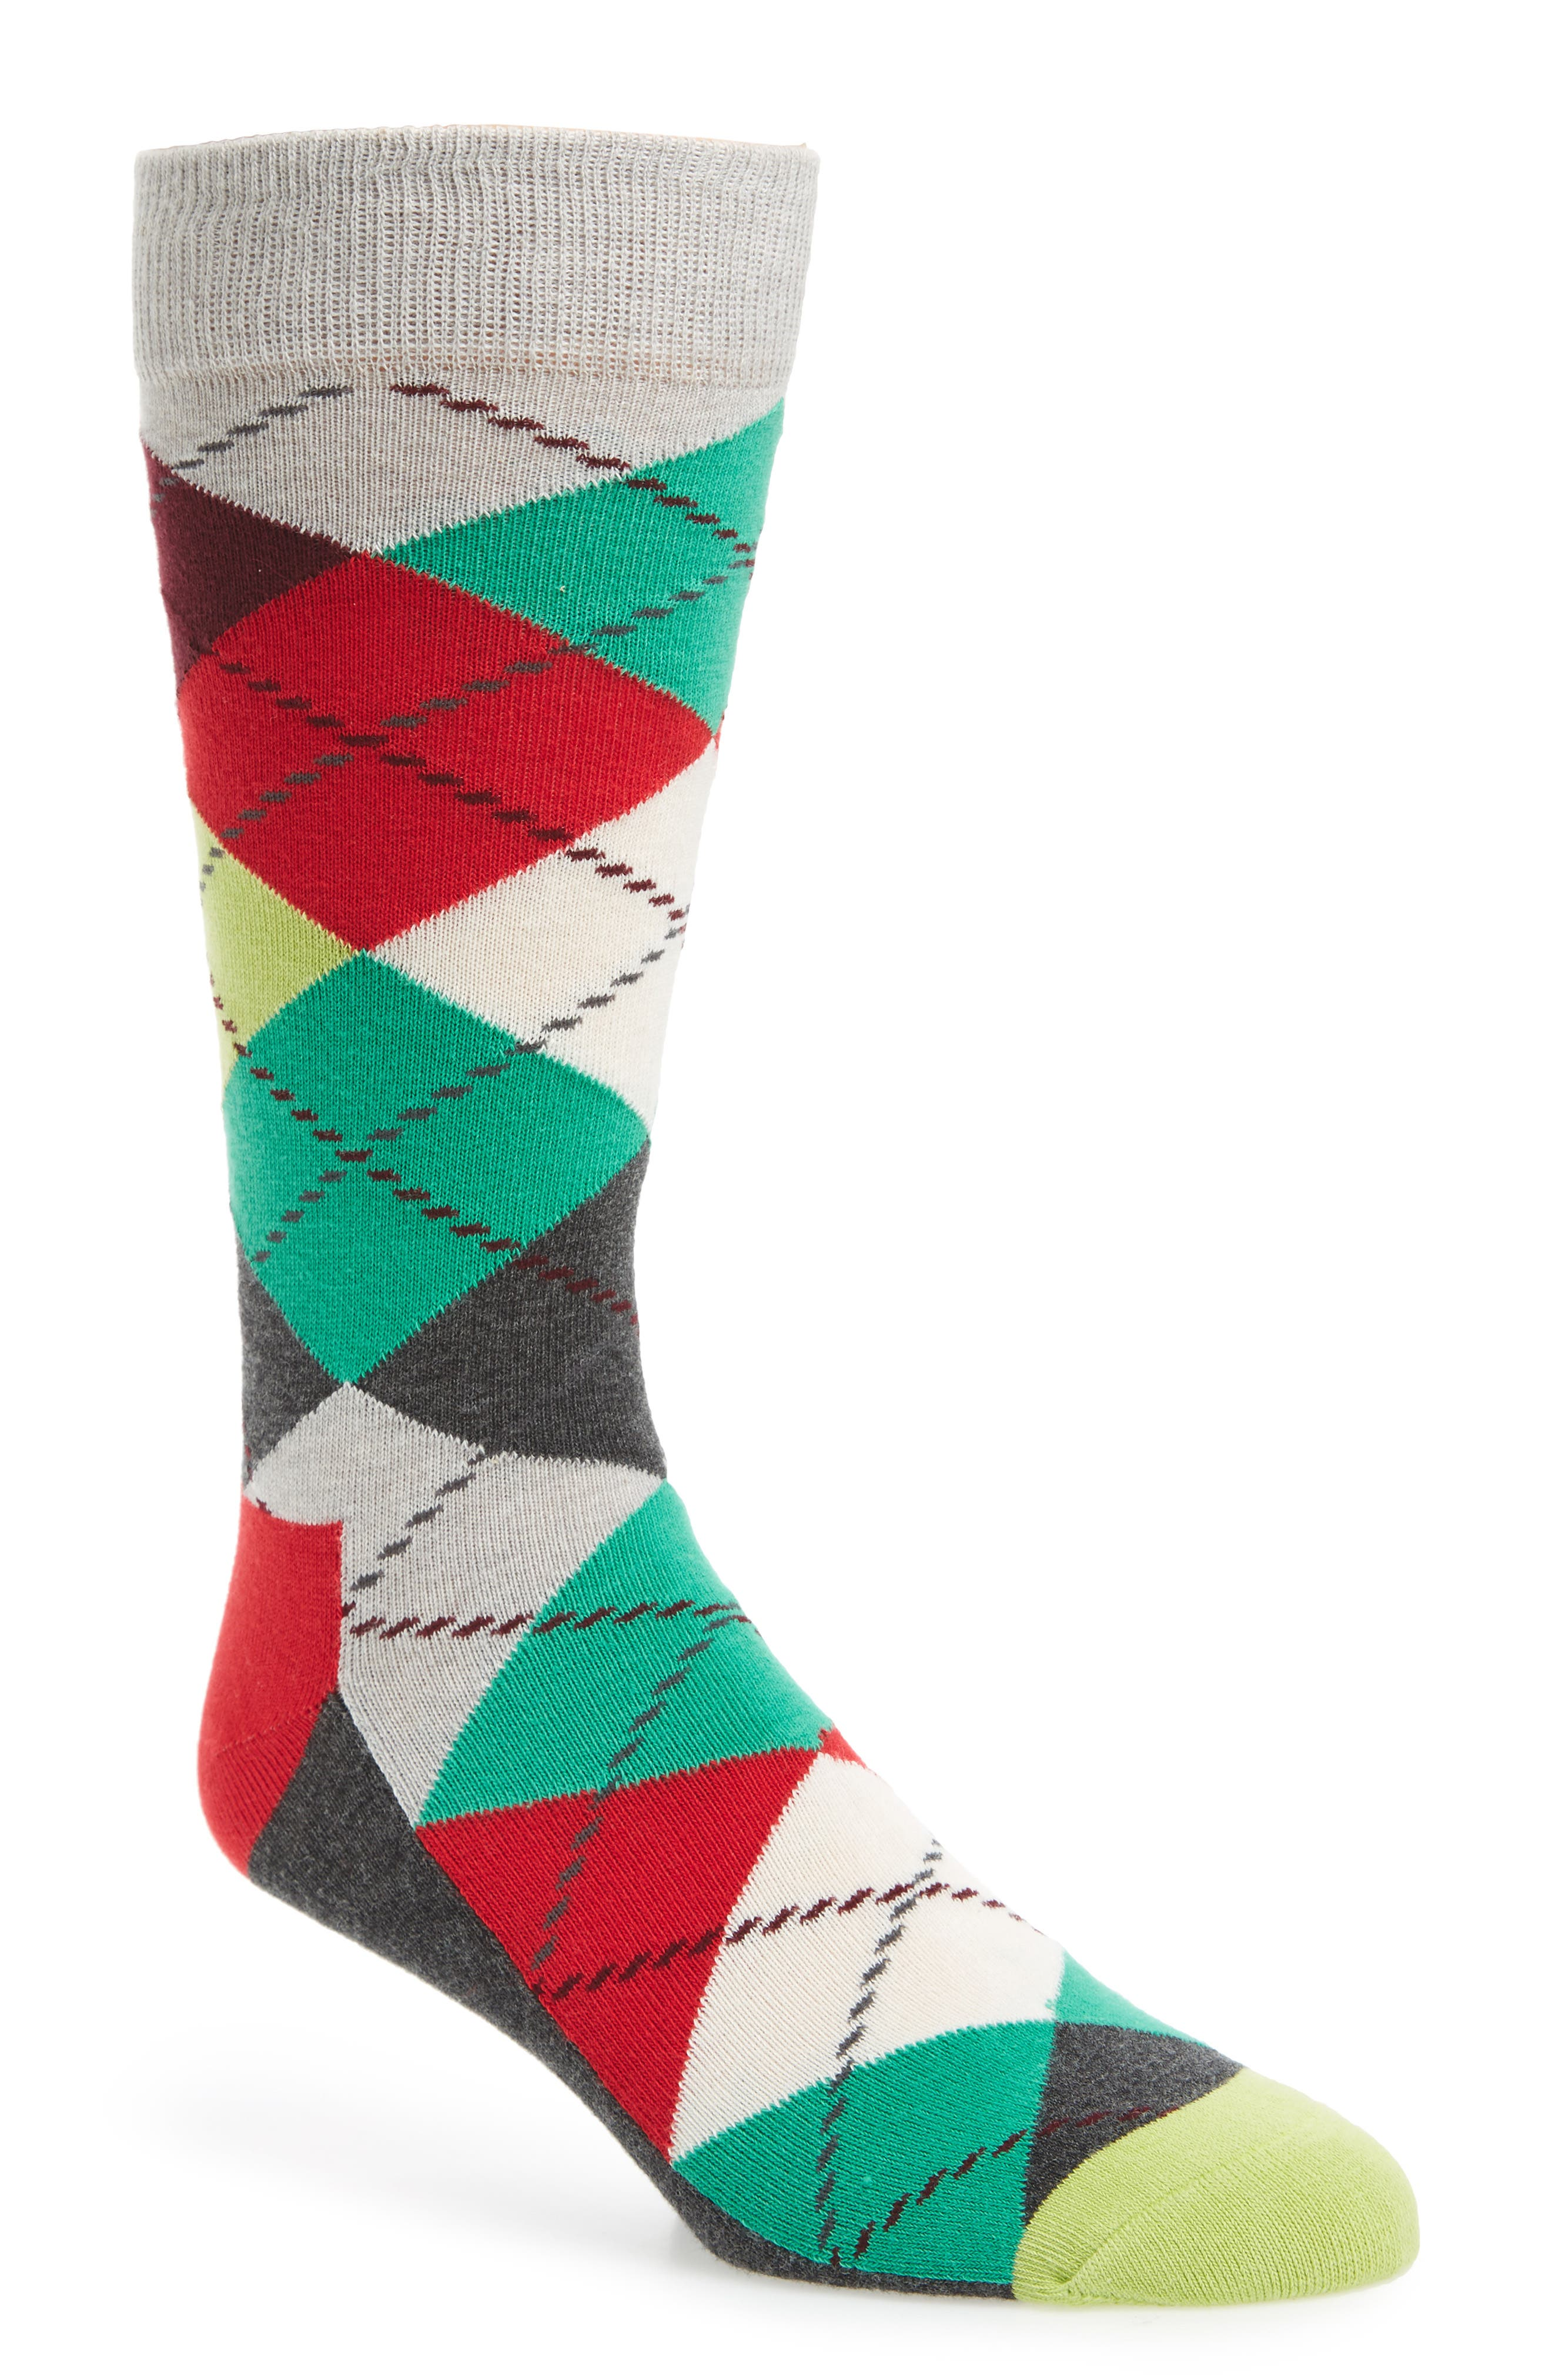 Argyle Socks,                         Main,                         color, Grey / Grey